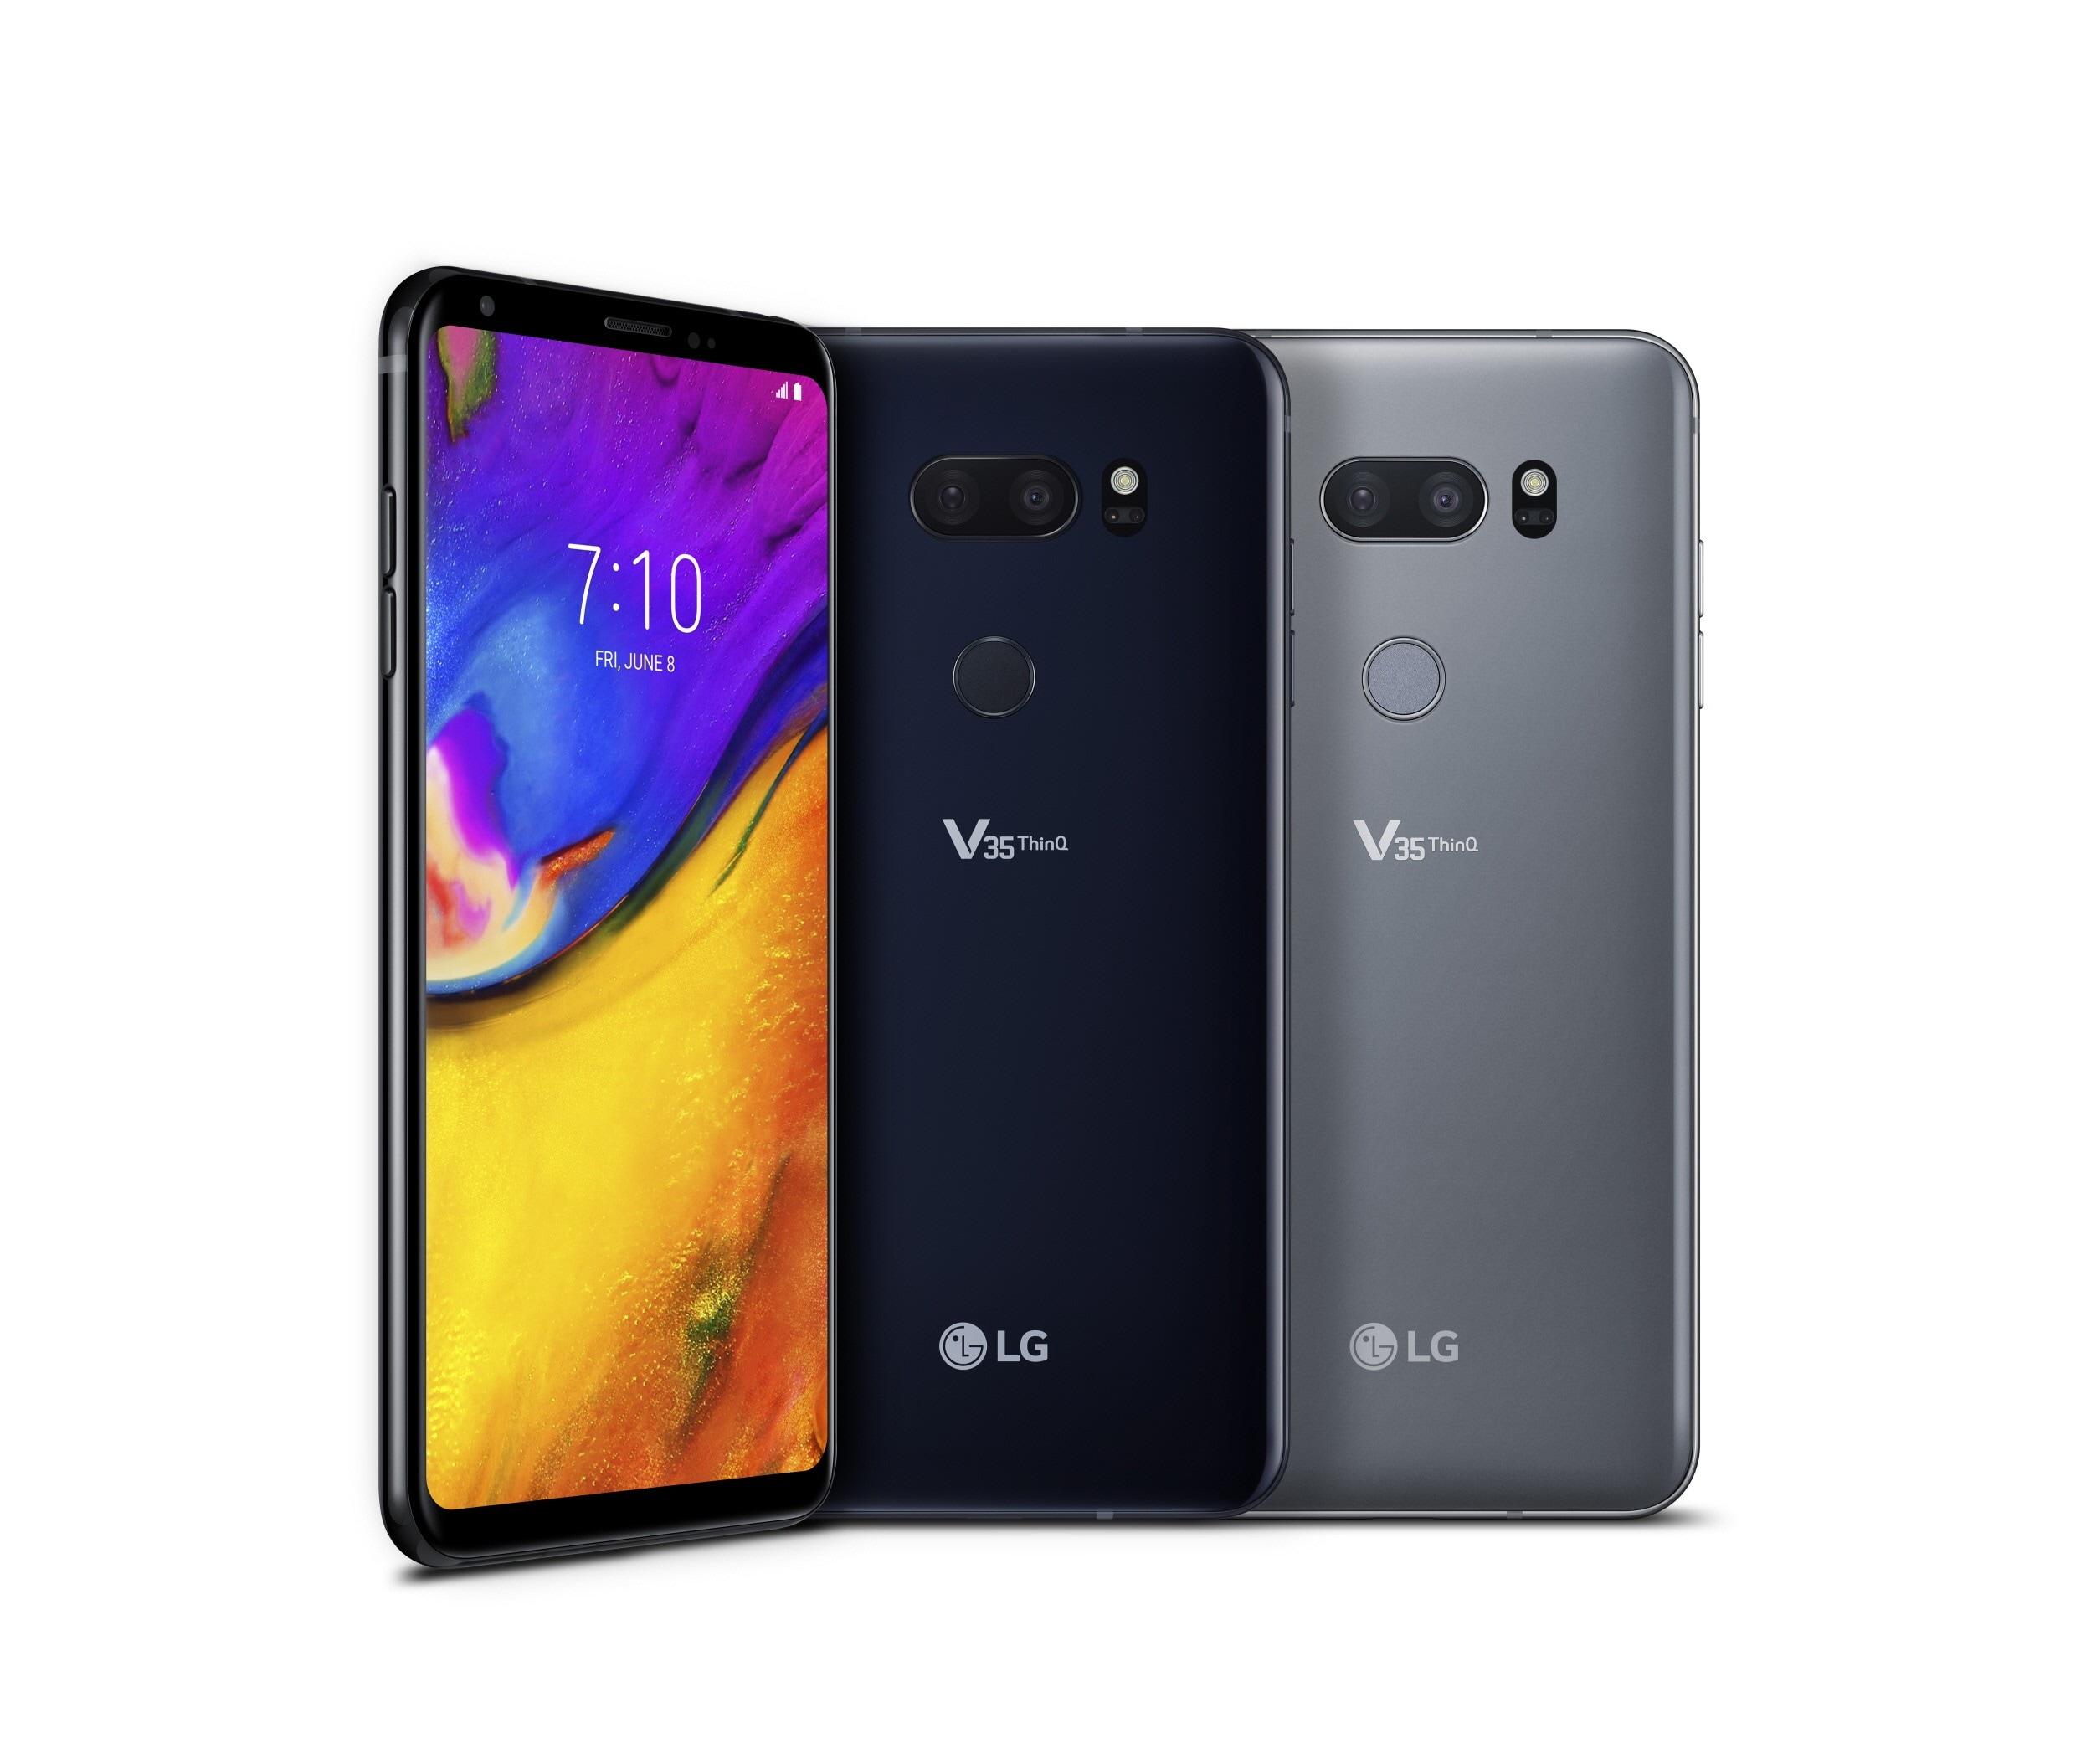 LG-V35-ThinQ-render-ufficiali-1